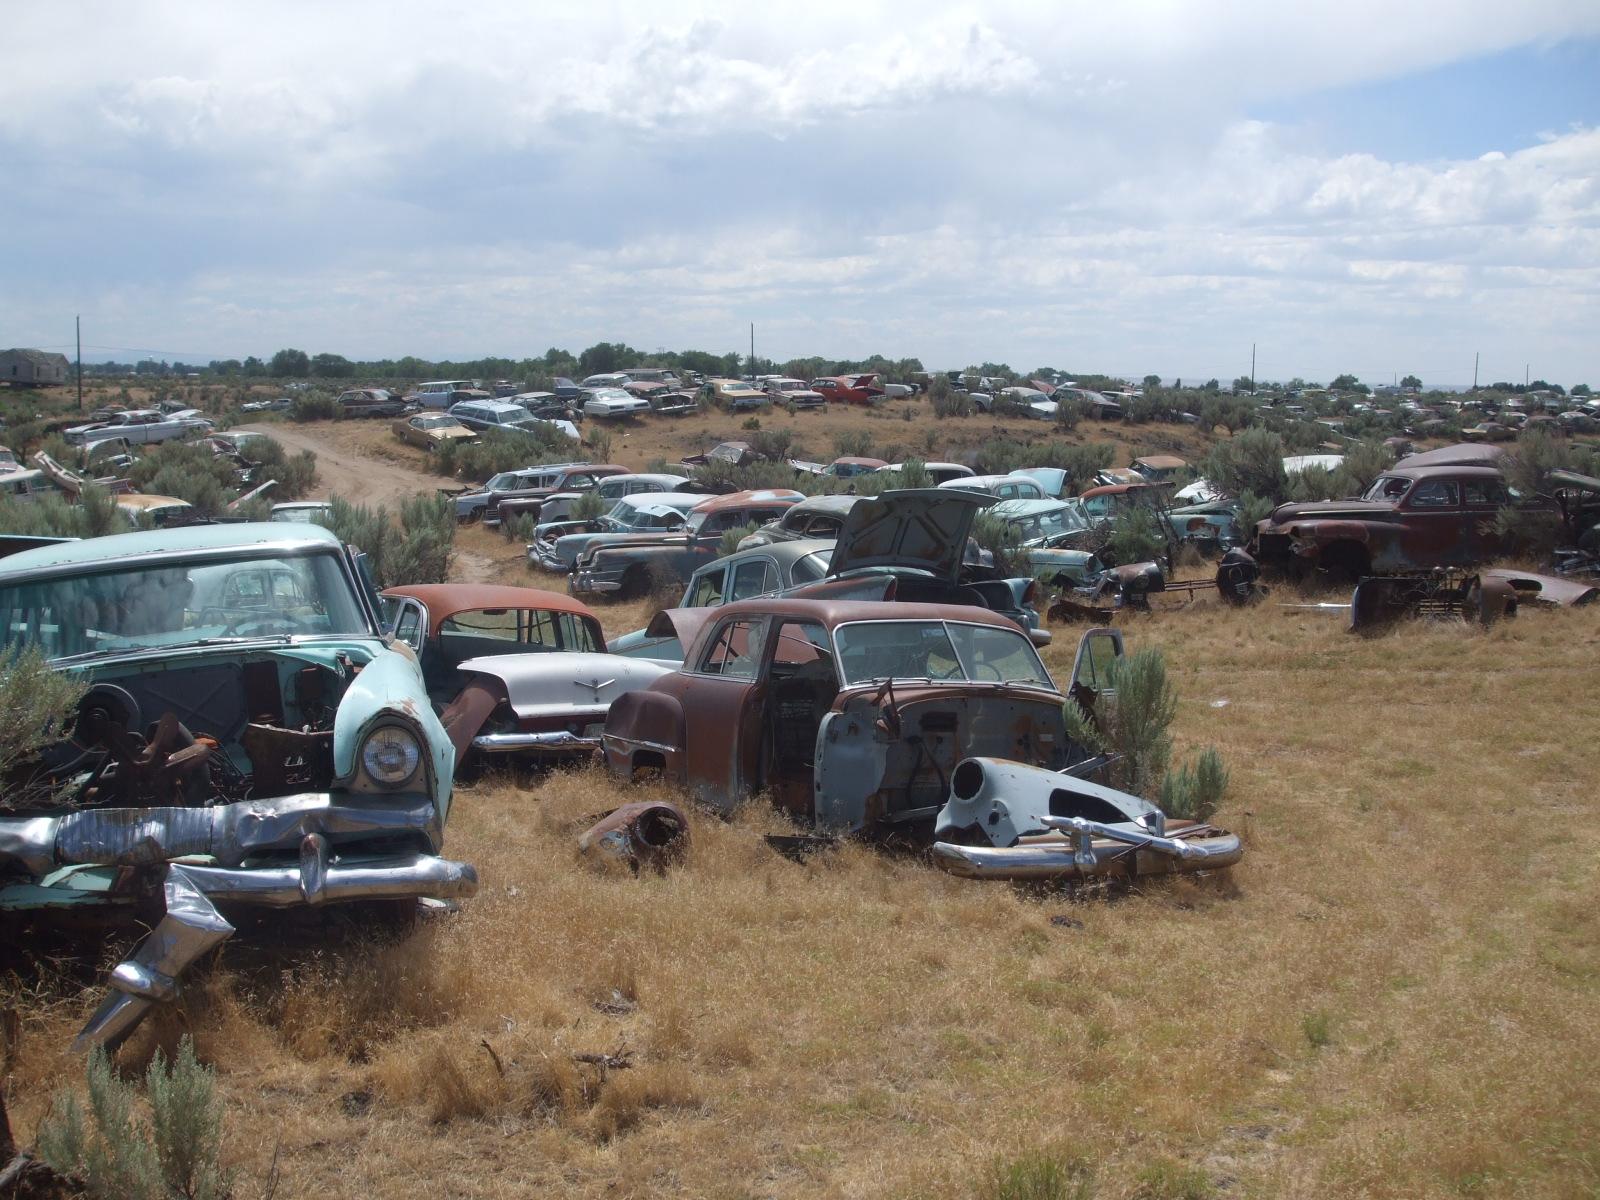 Junkyard Auto Body Parts Pictures